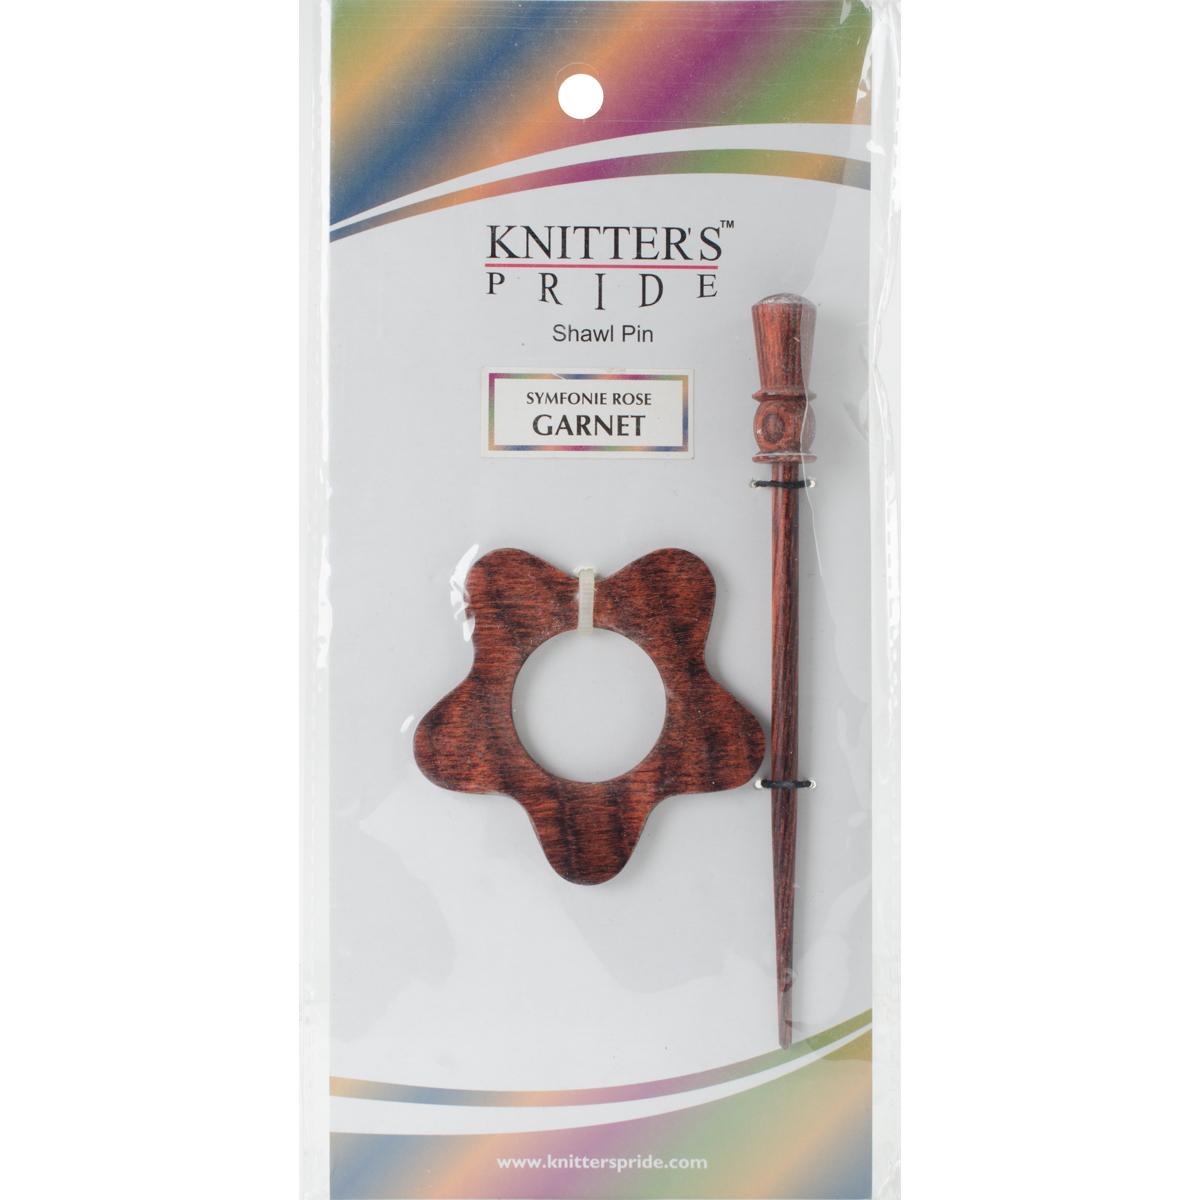 Symfonie Rose Shawl Pin-Garnet by Knitter's Pride